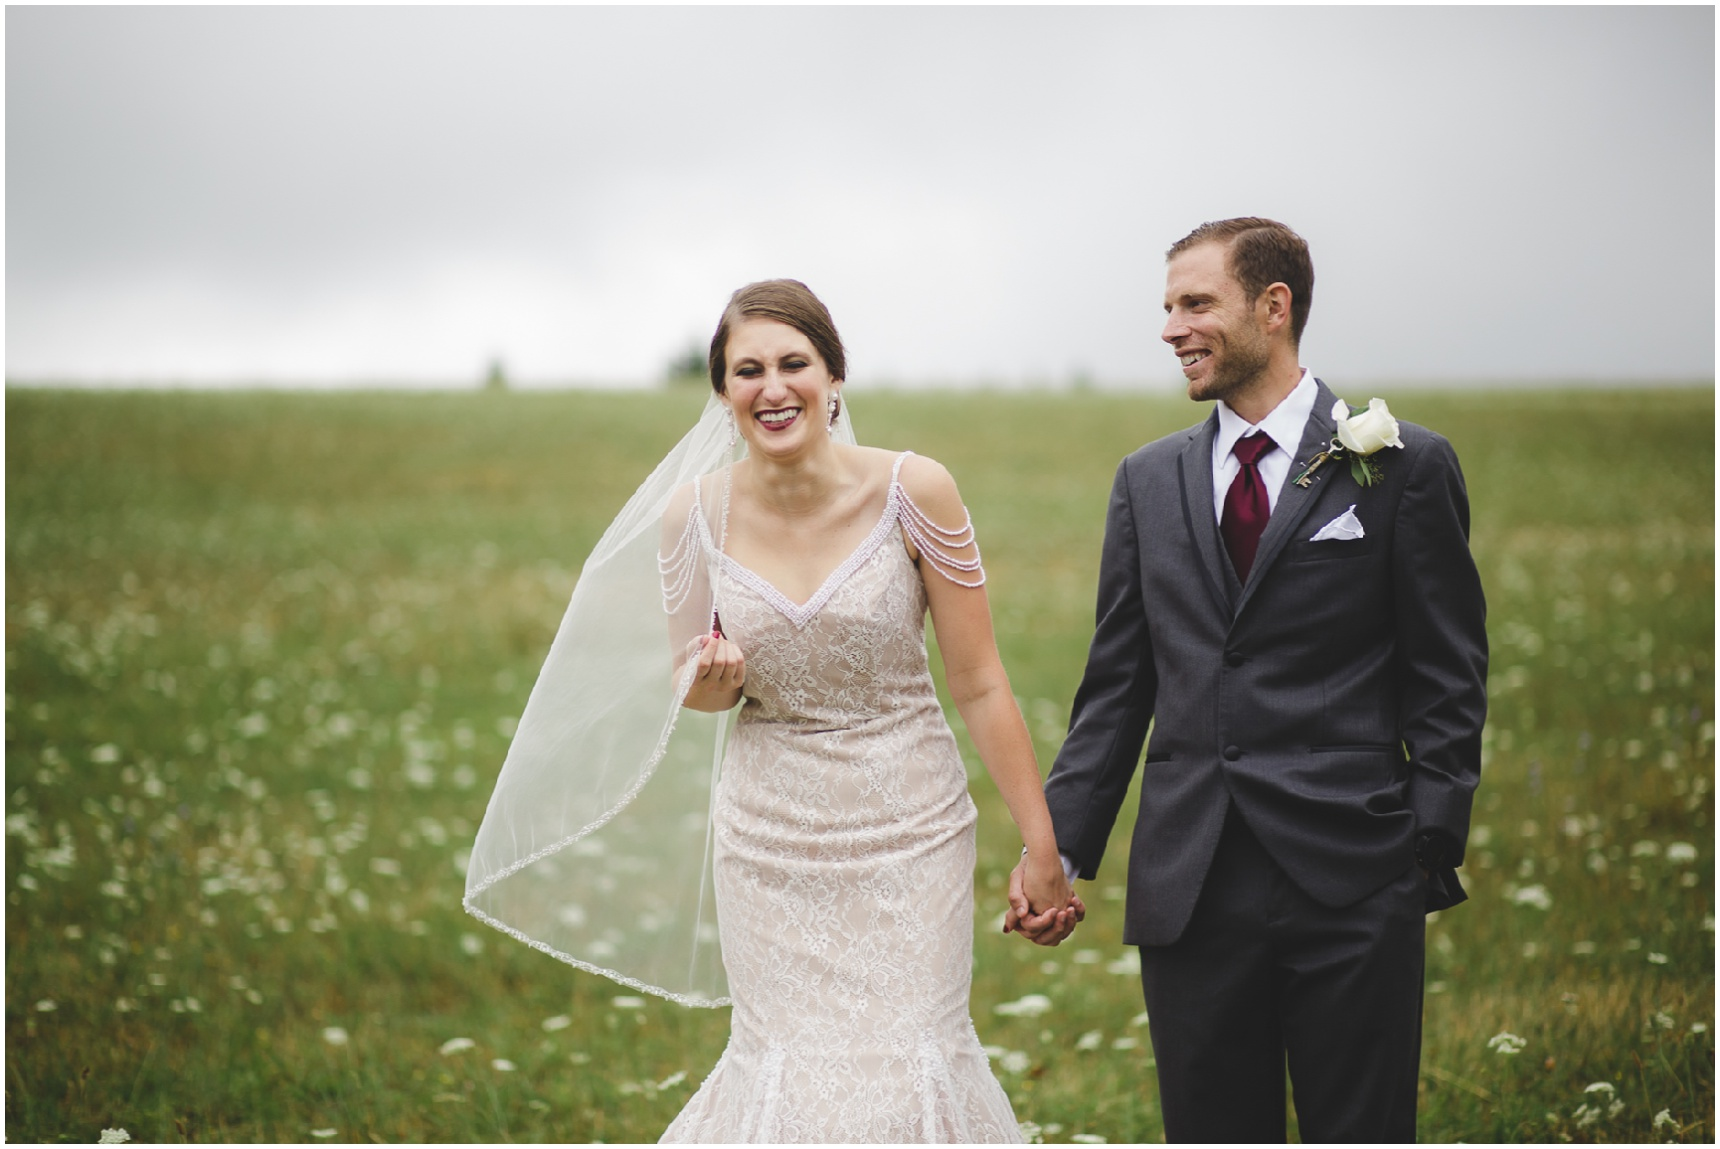 Buffalo_Wedding_Photography_Pics_045.jpg